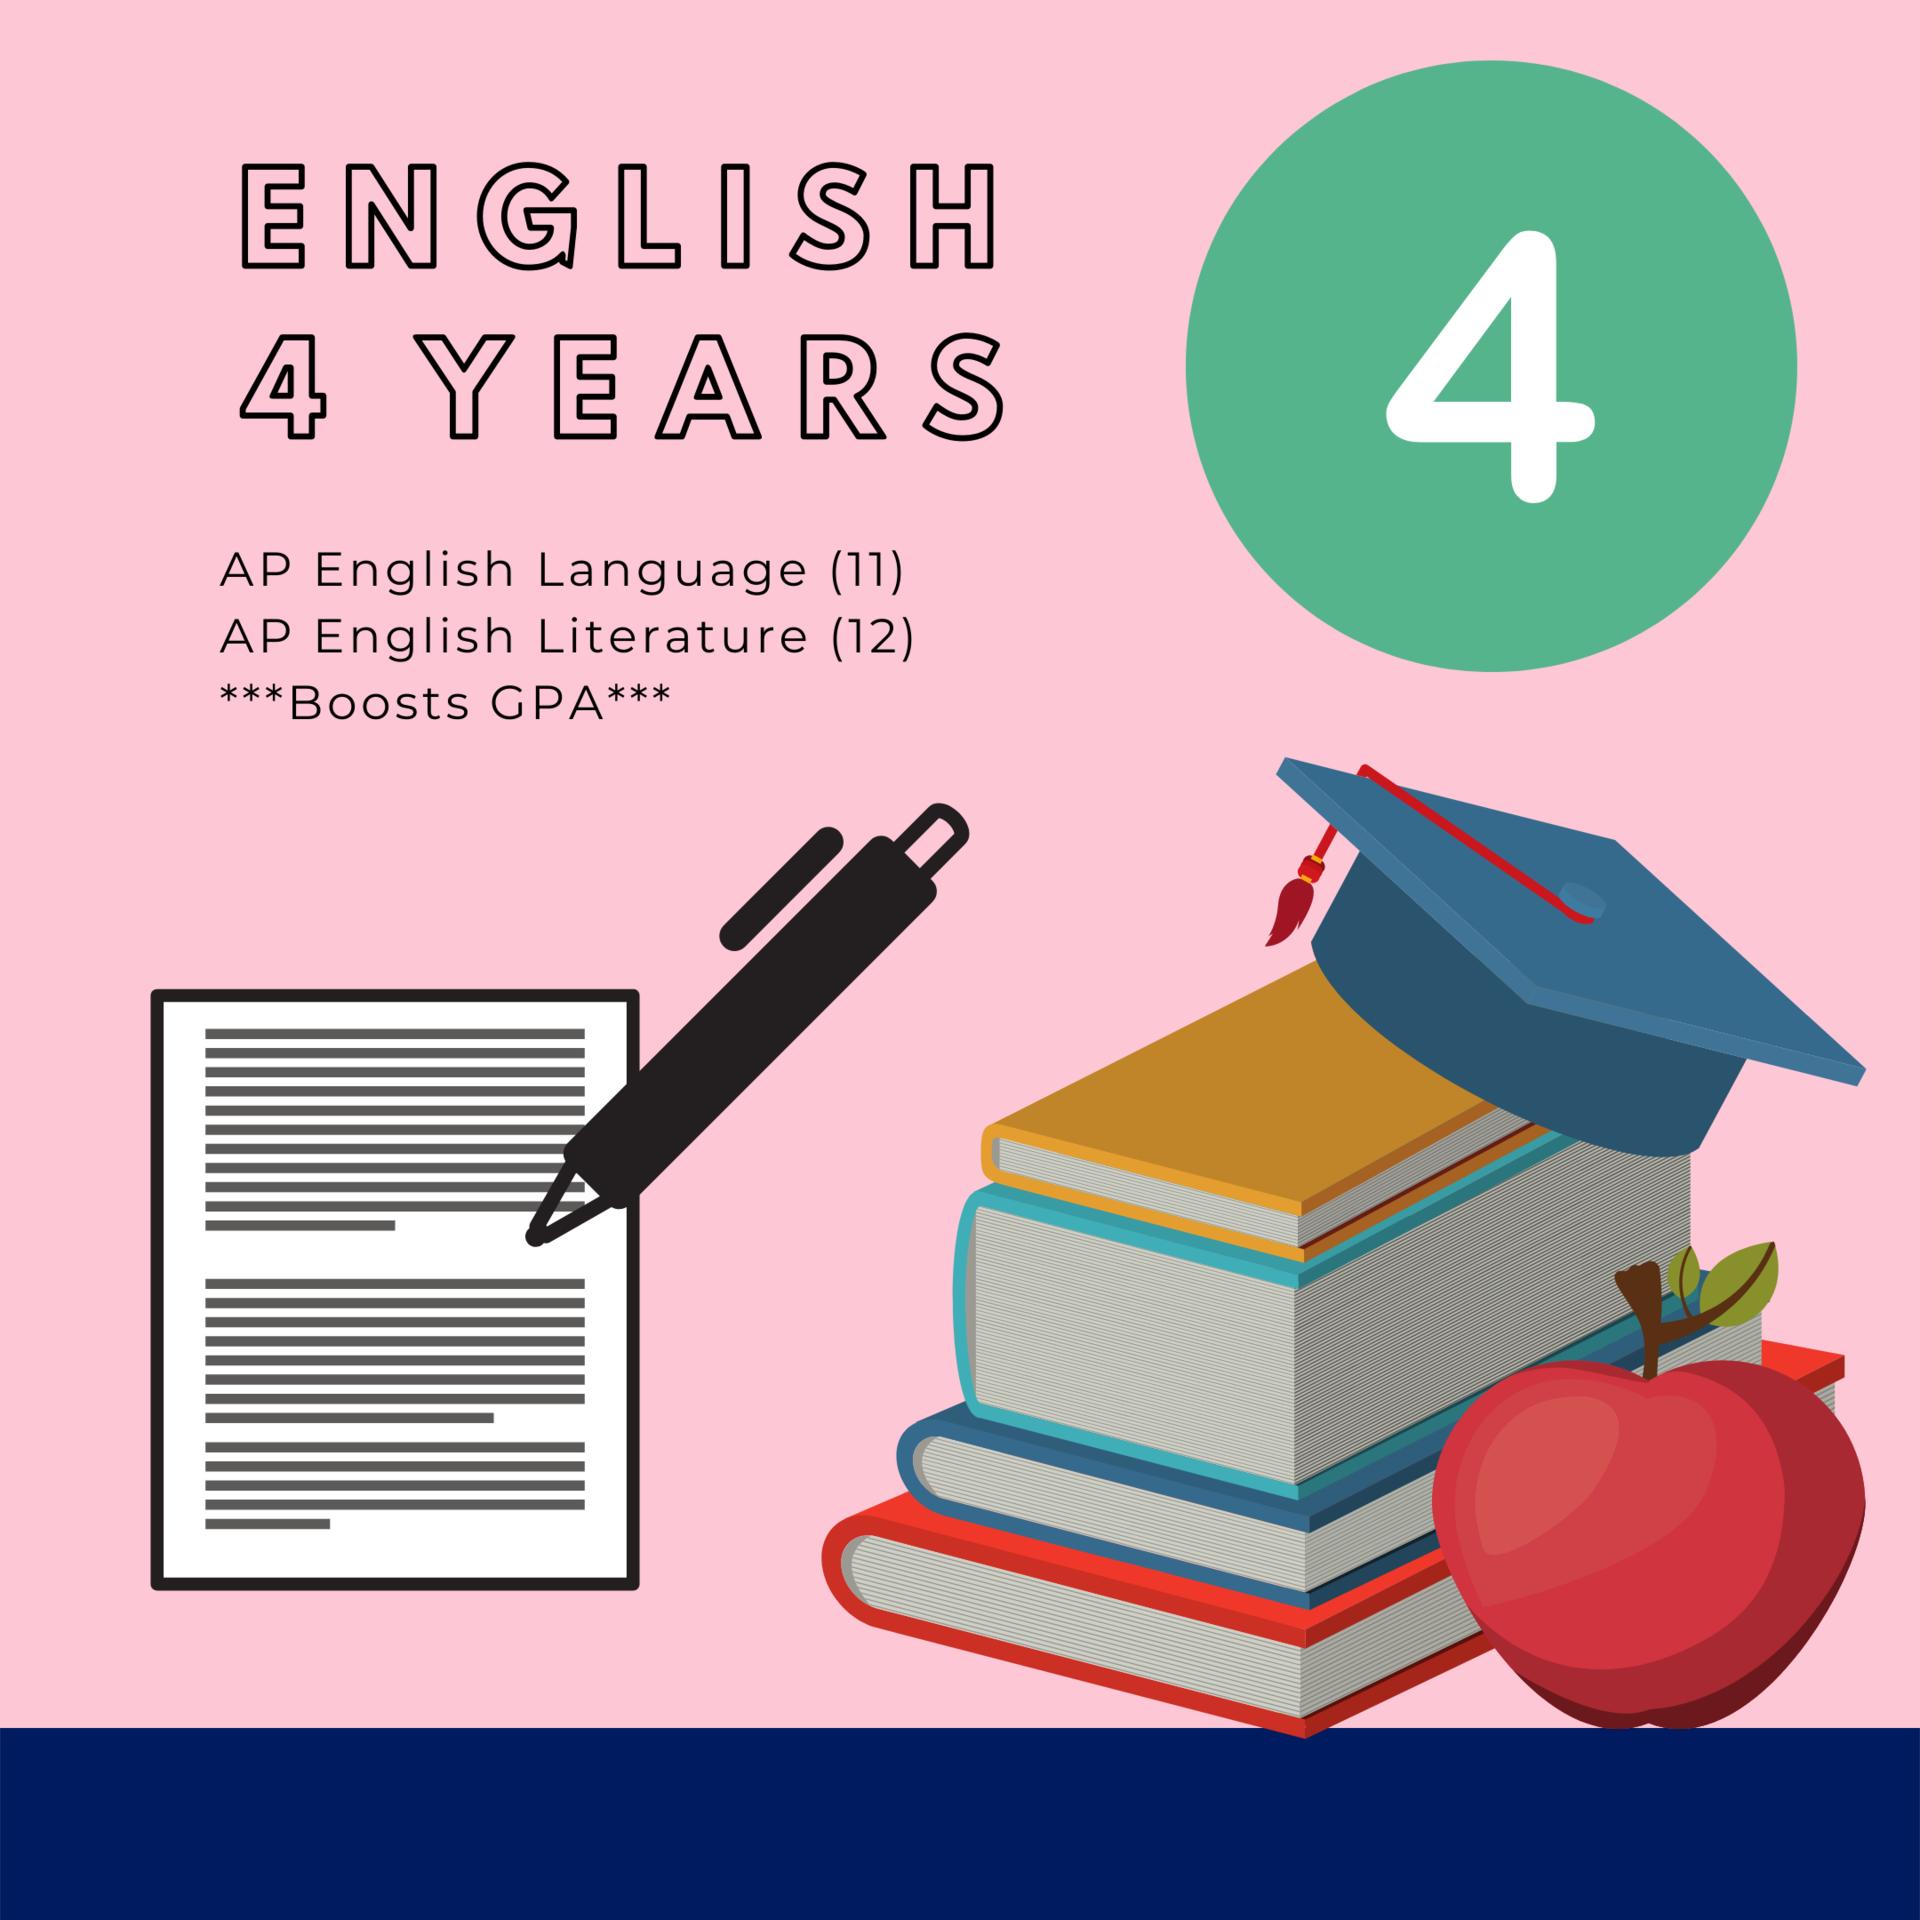 English - 4 Years